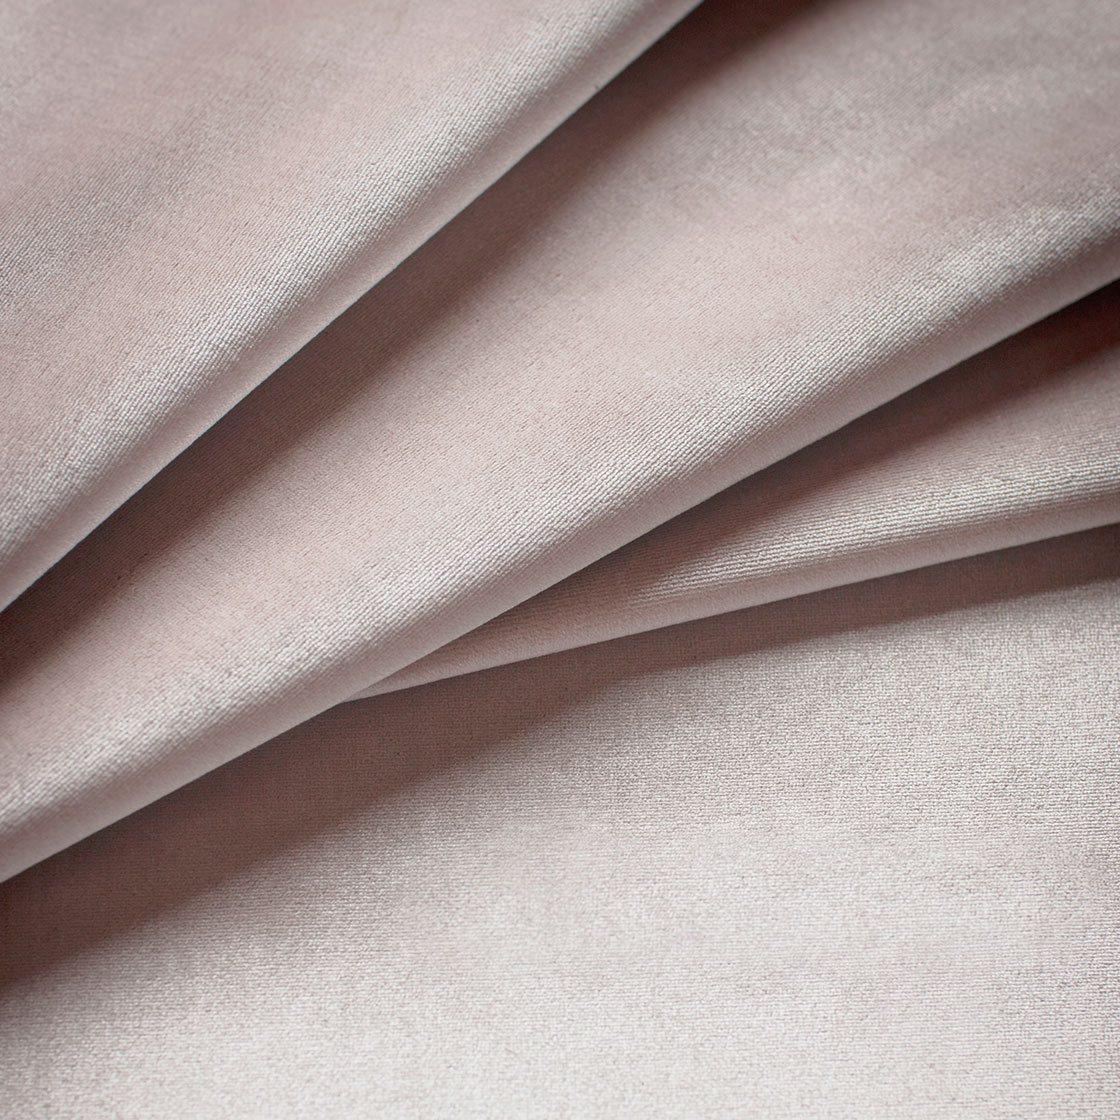 Capri Silk Velvet - Blush - Beaumont & Fletcher - Beaumont & Fletcher